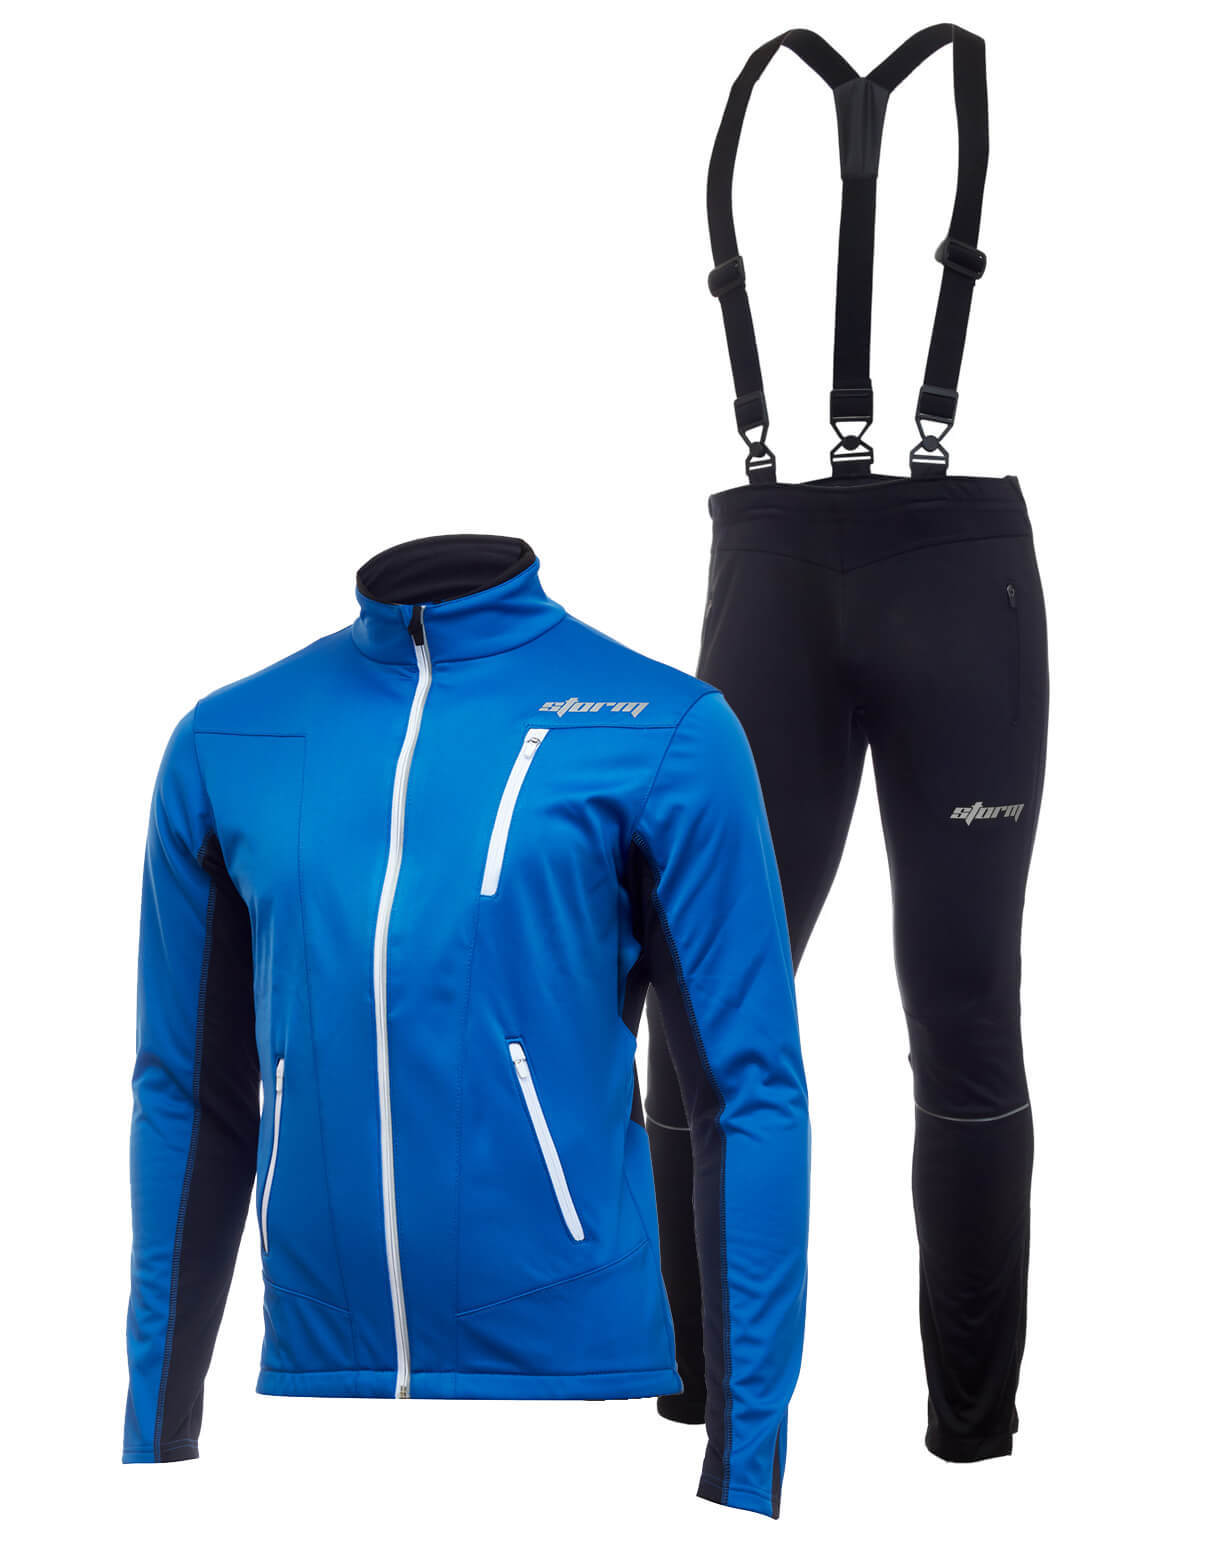 Утеплённый лыжный костюм Storm Speed (Шторм) blue мужской